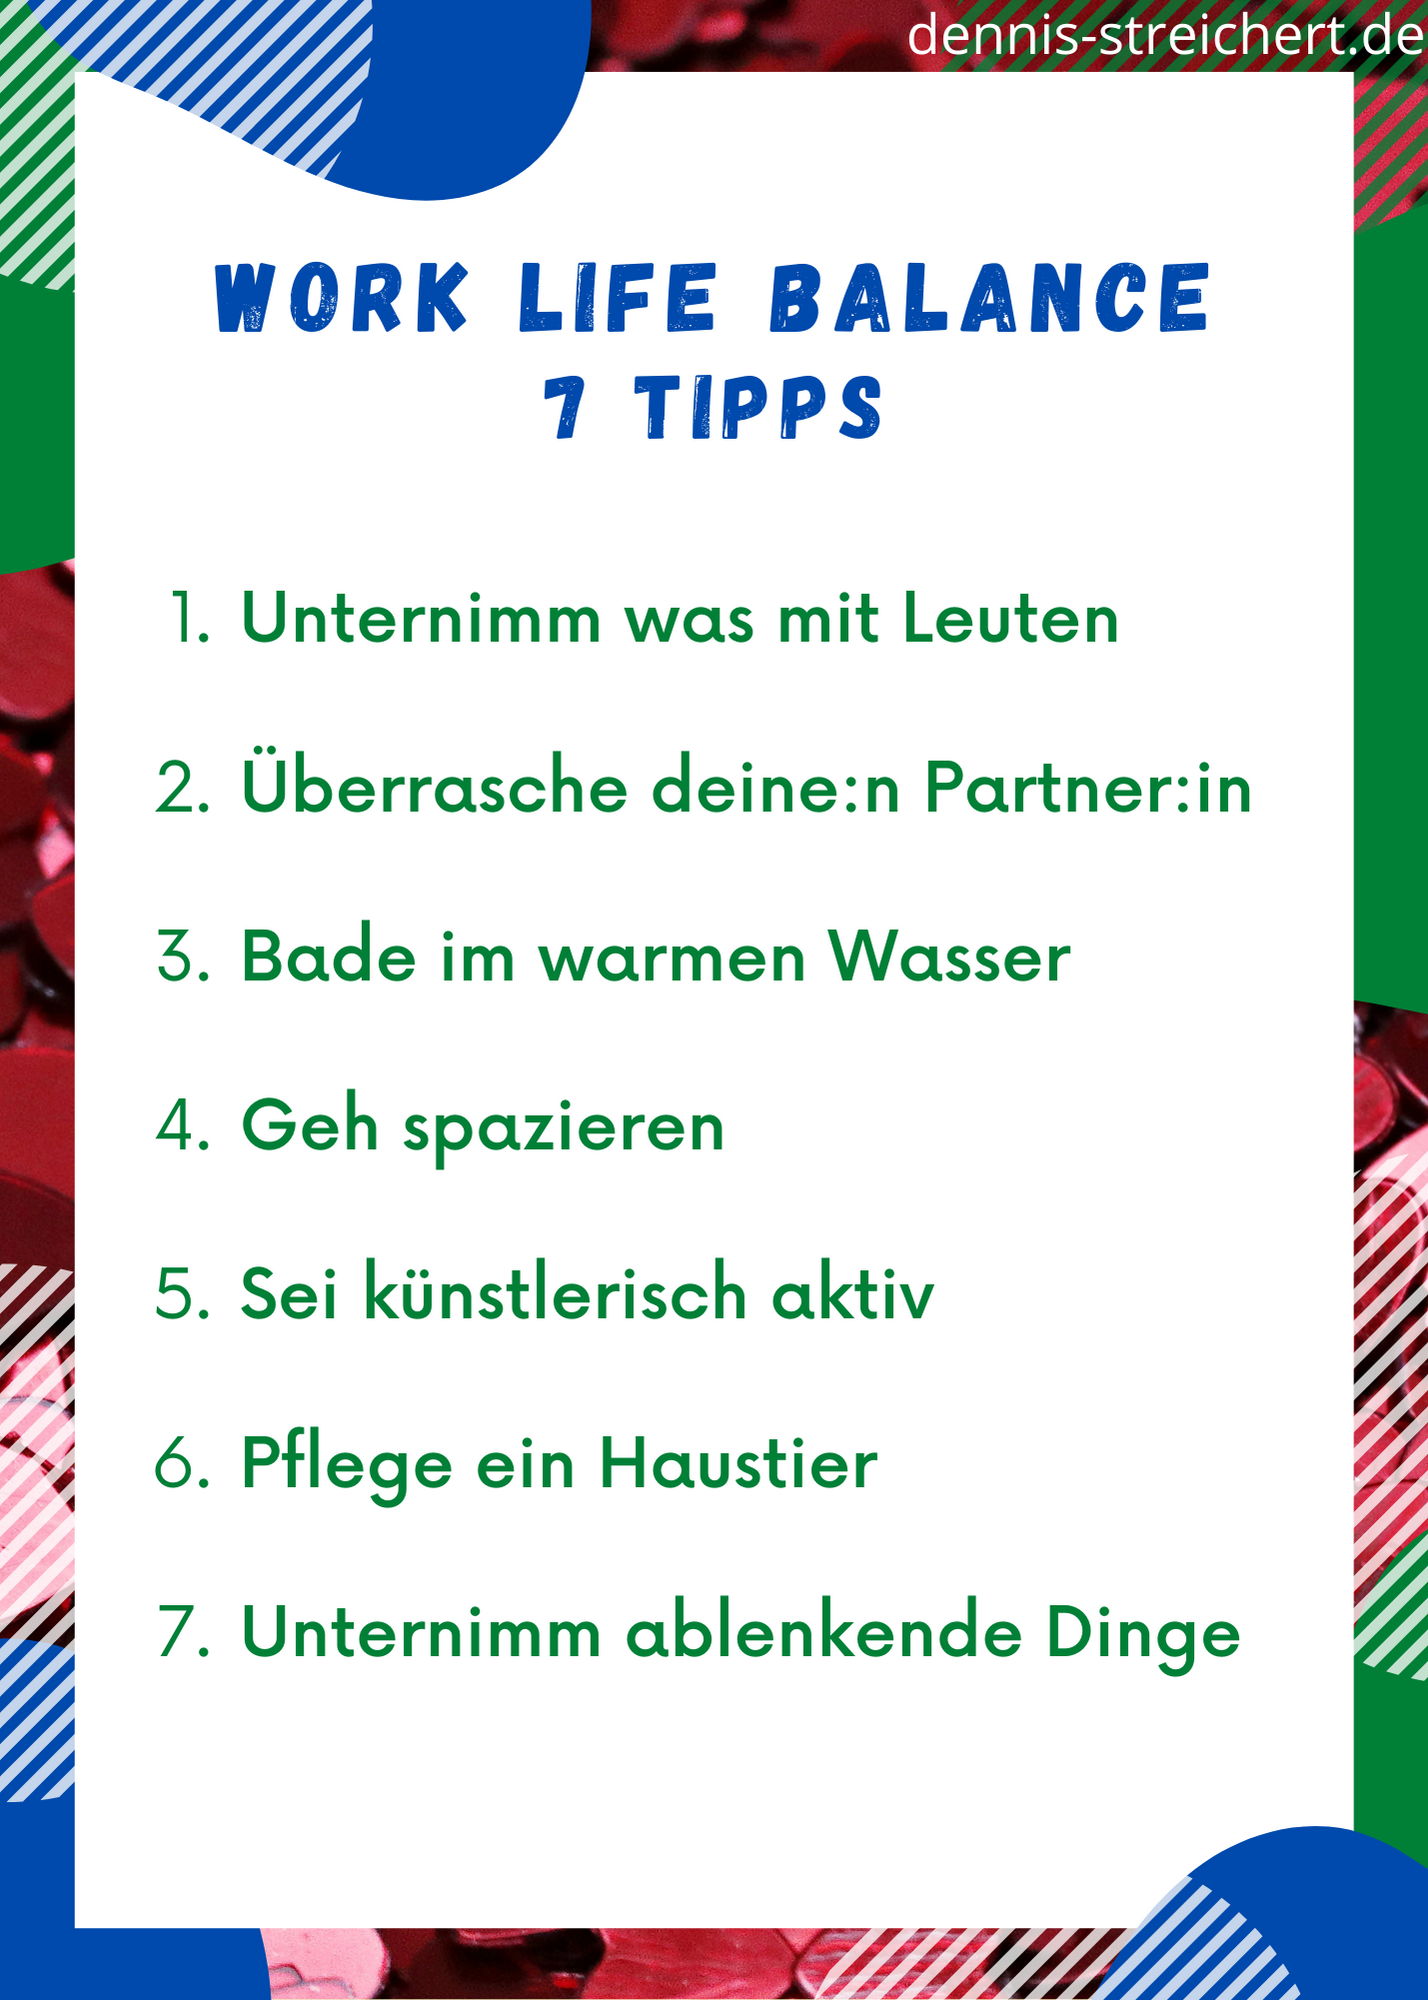 Work Life Balance Maßnahmen Tipps